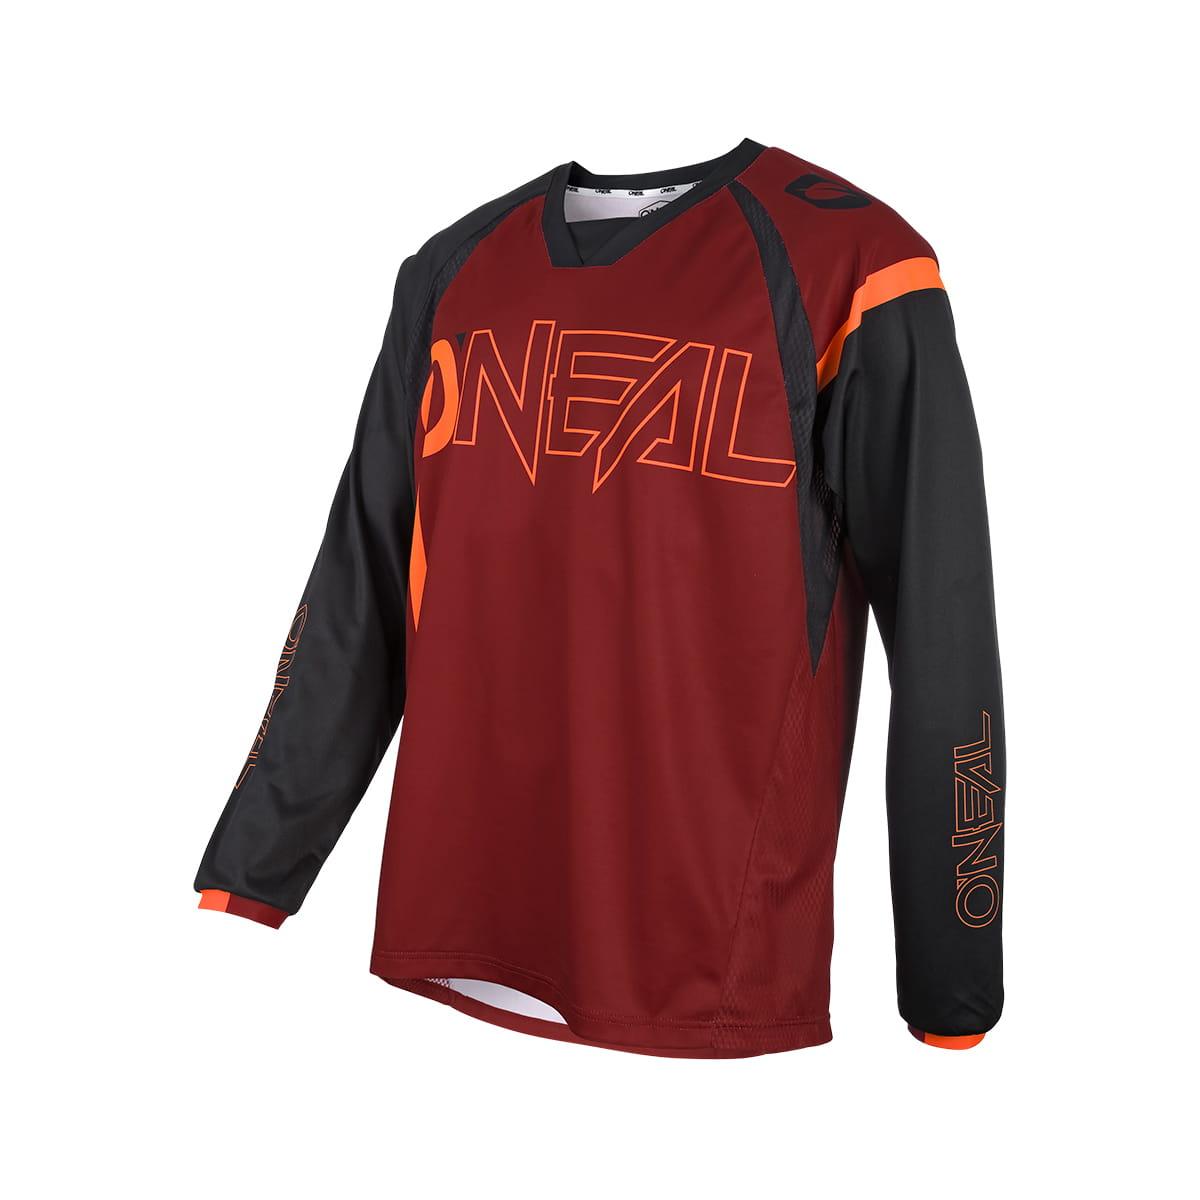 O/'Neal Element FR Fahrrad Trikot Shirt Jersey DH Downhill Freeride Mountain Bike